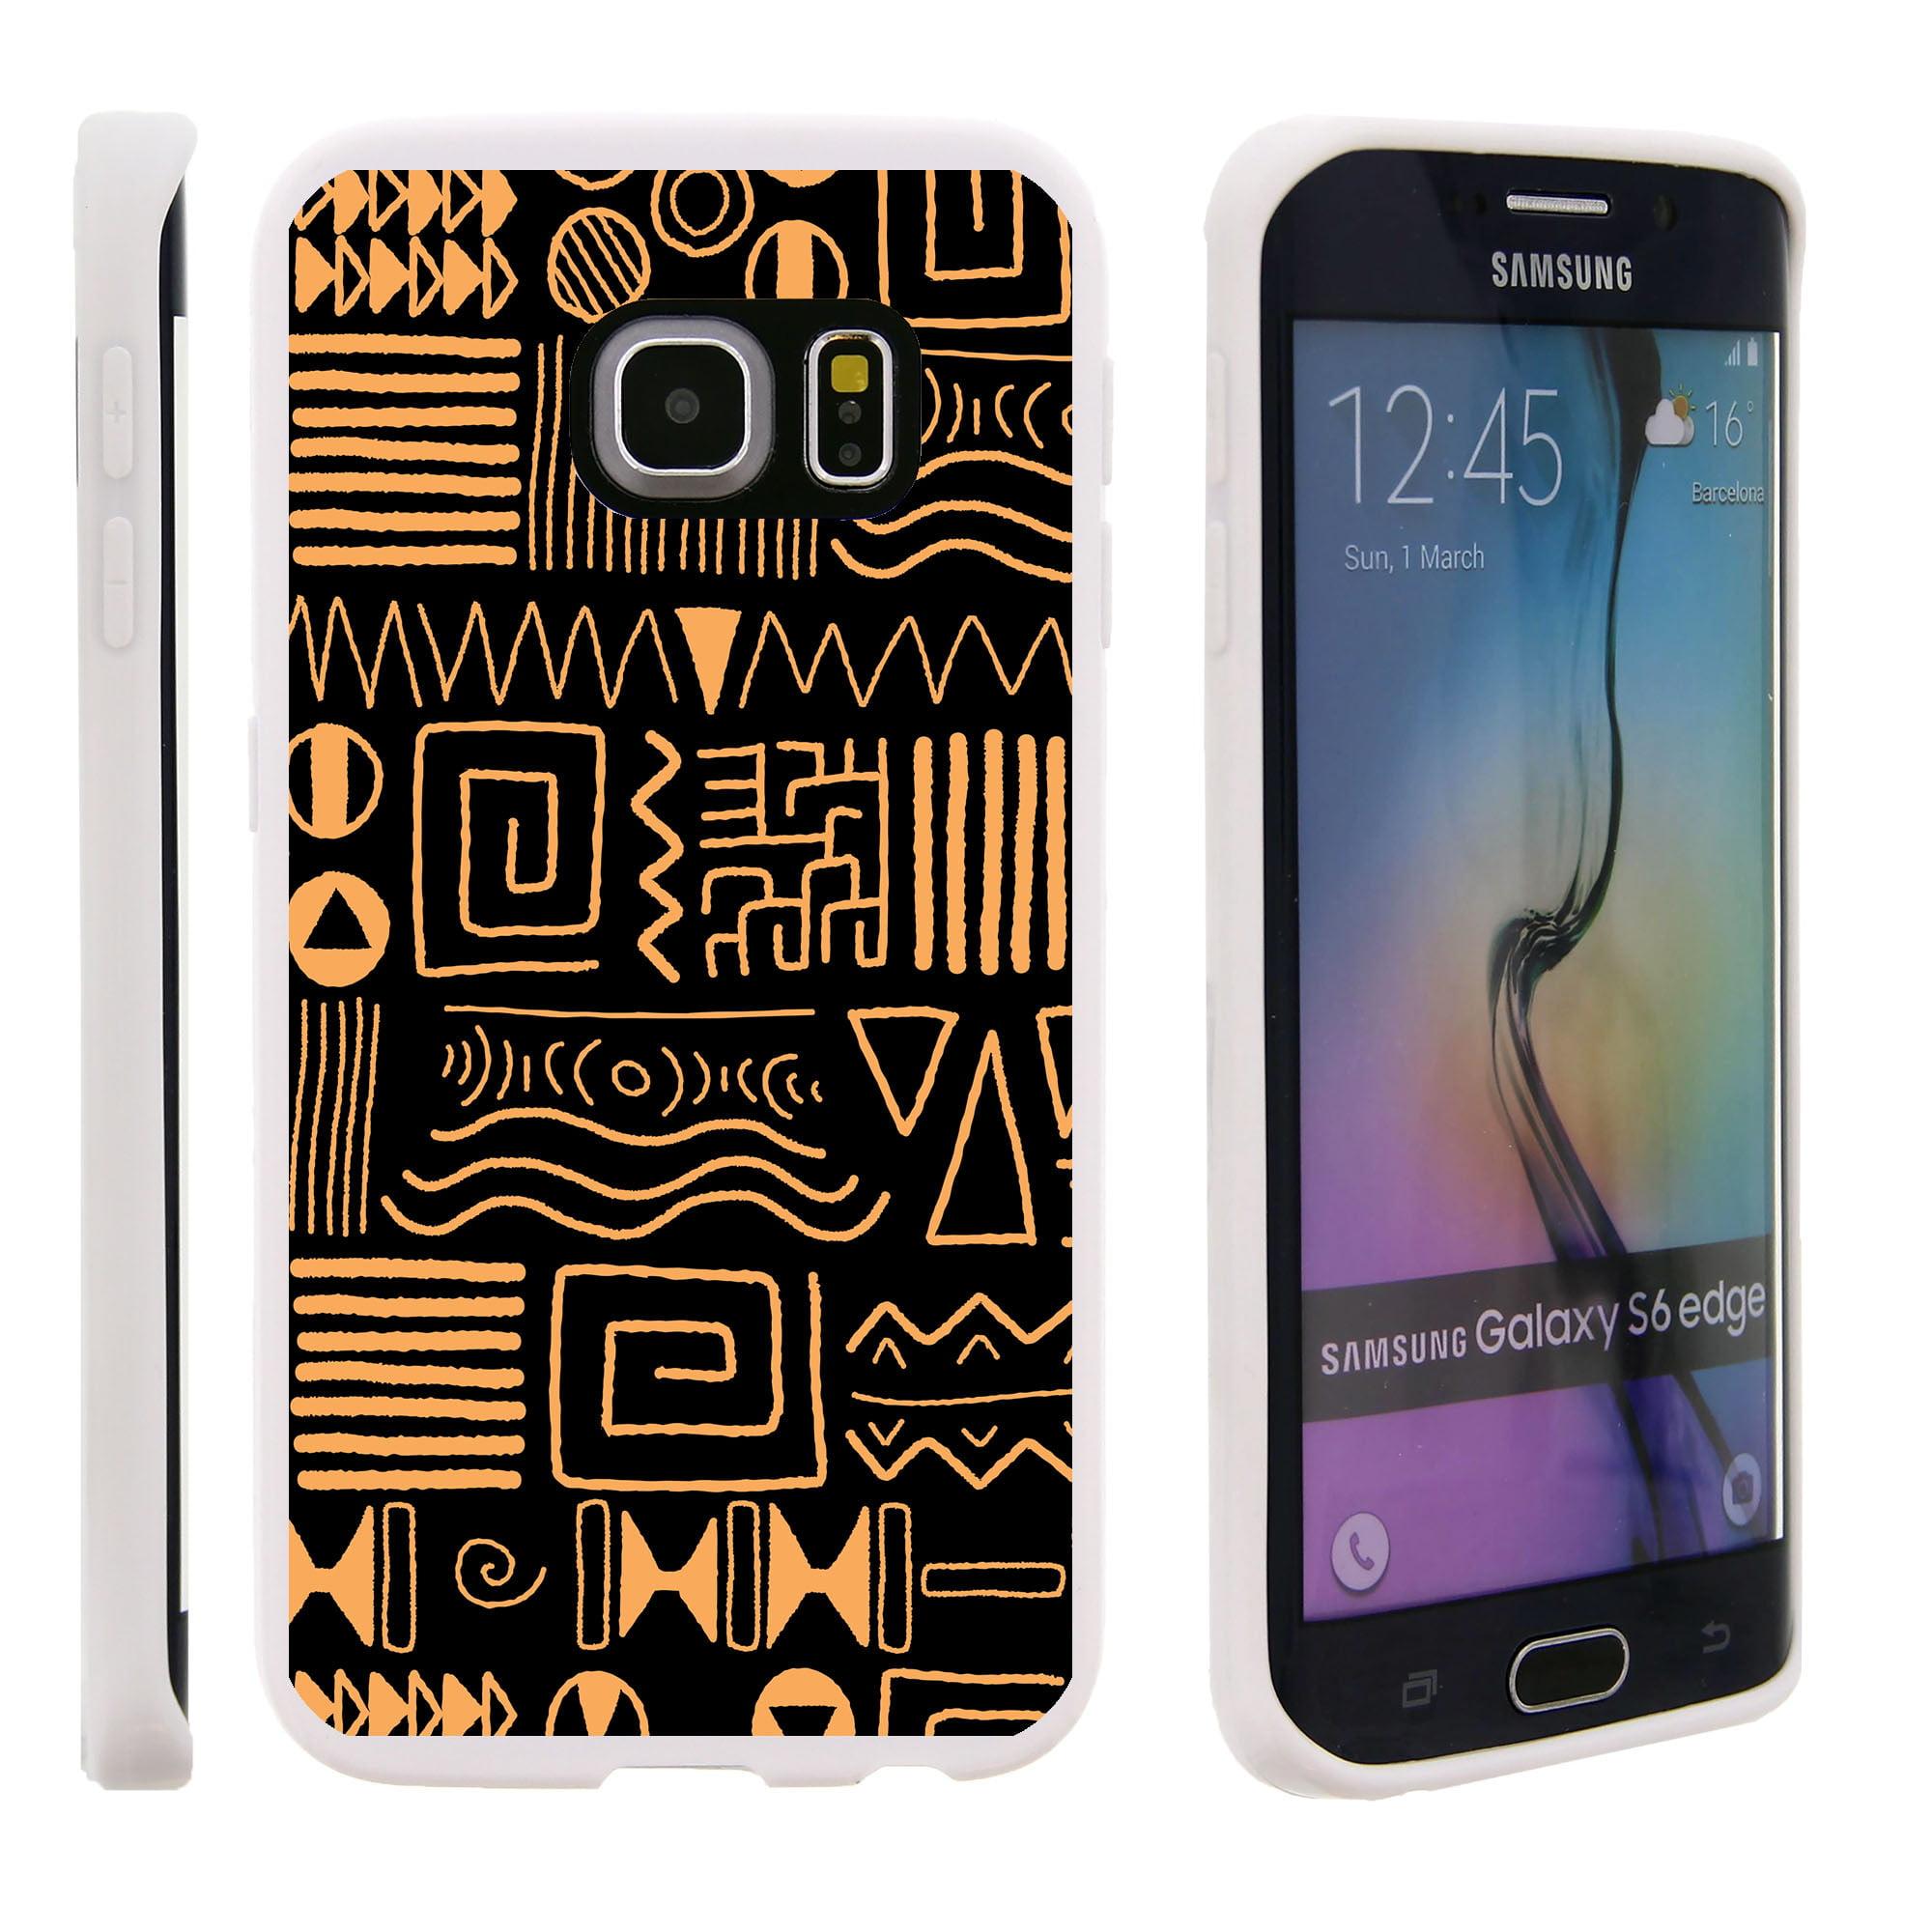 Samsung Galaxy S6 Edge G925, Flexible Case [FLEX FORCE] Slim Durable TPU Sleek Bumper with Unique Designs - Shape Symbols